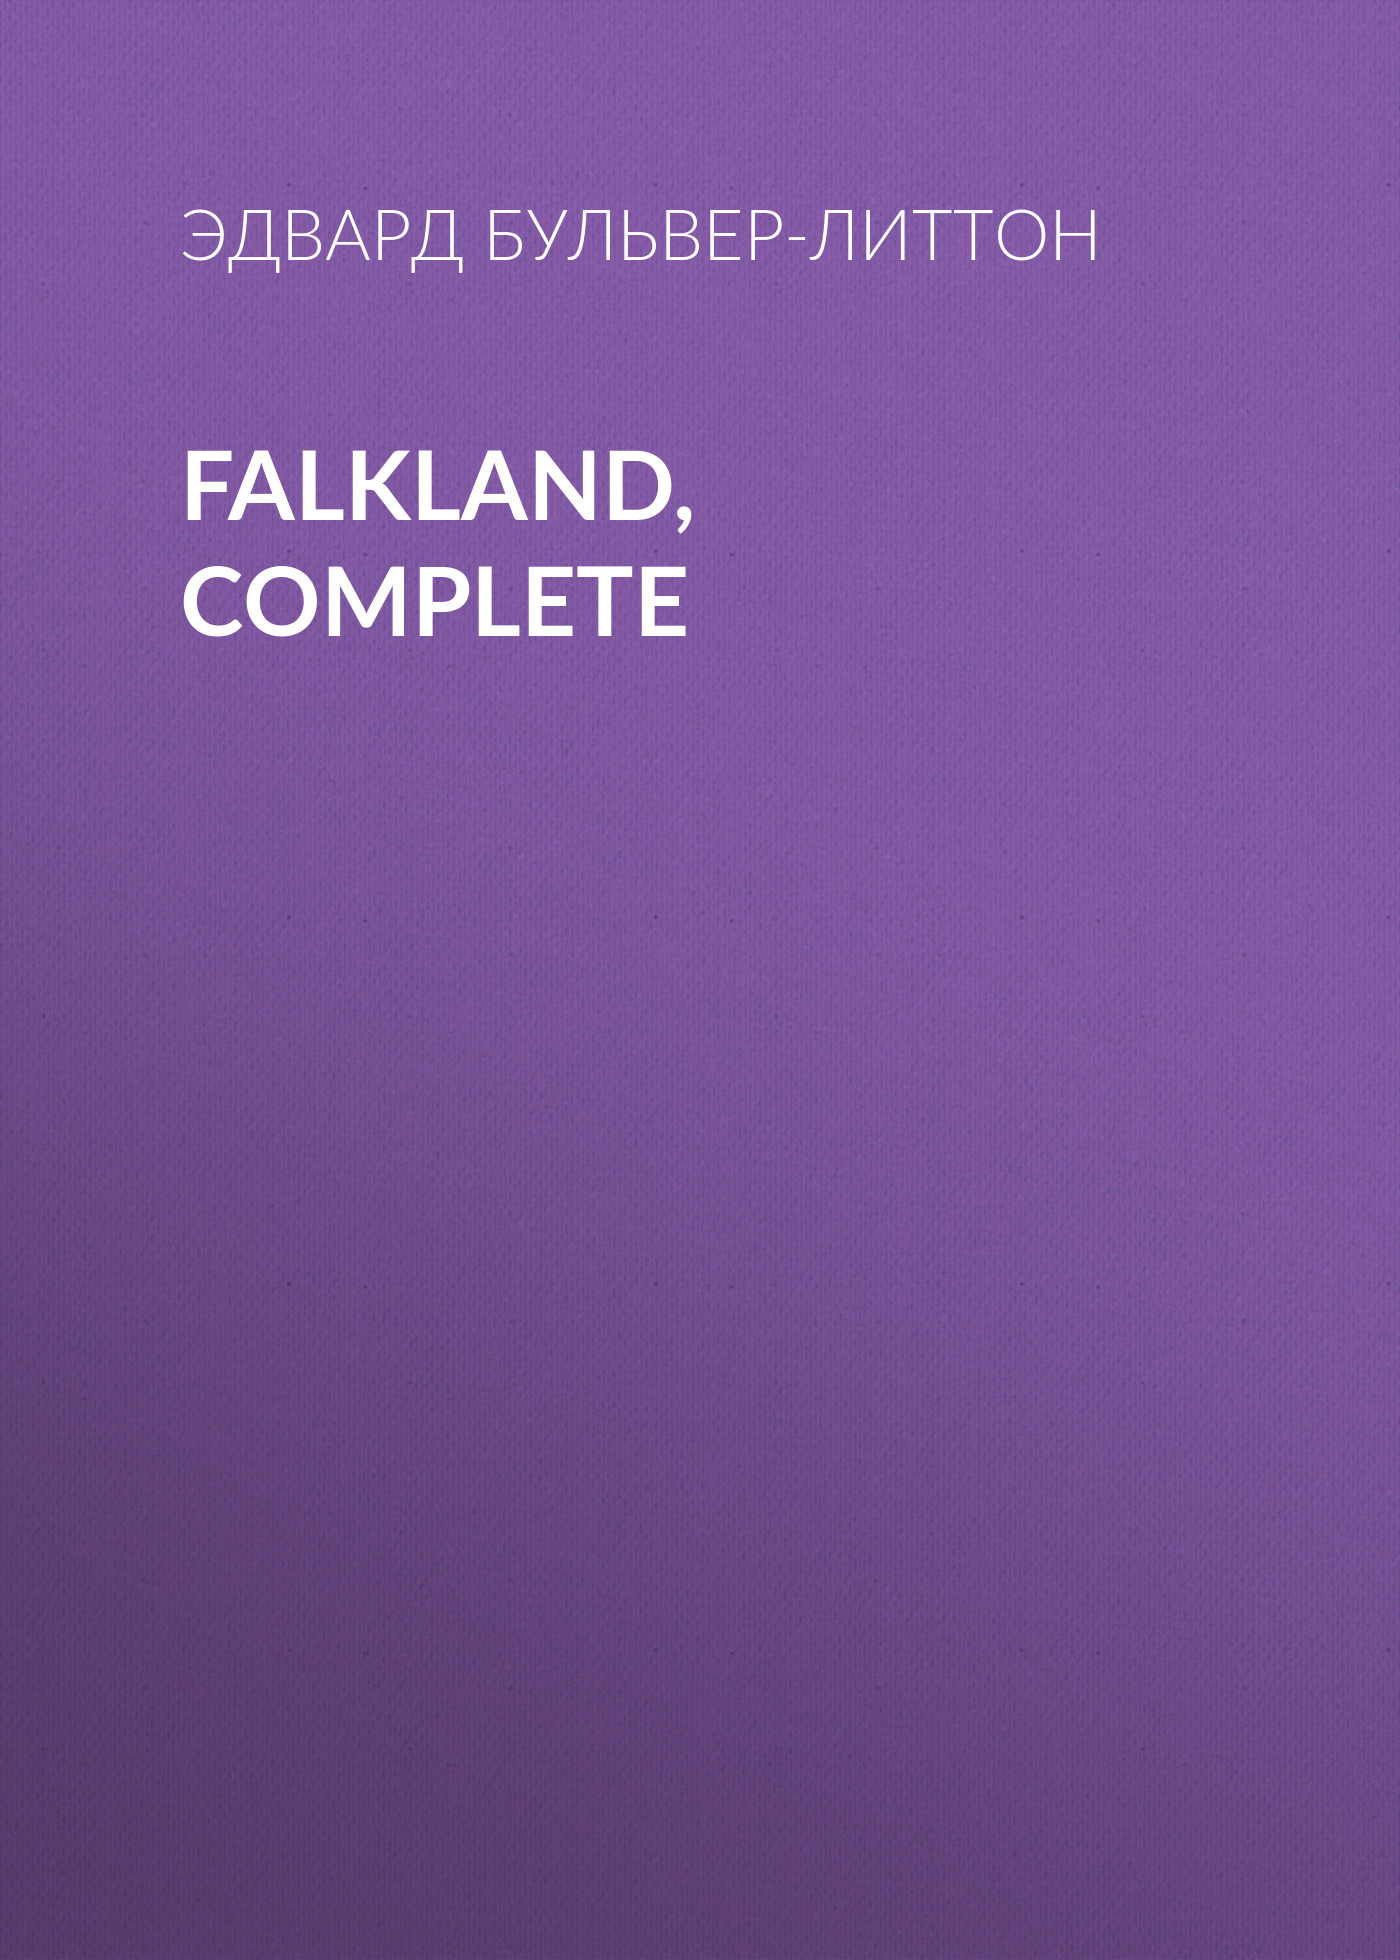 Falkland, Complete ( Эдвард Бульвер-Литтон  )